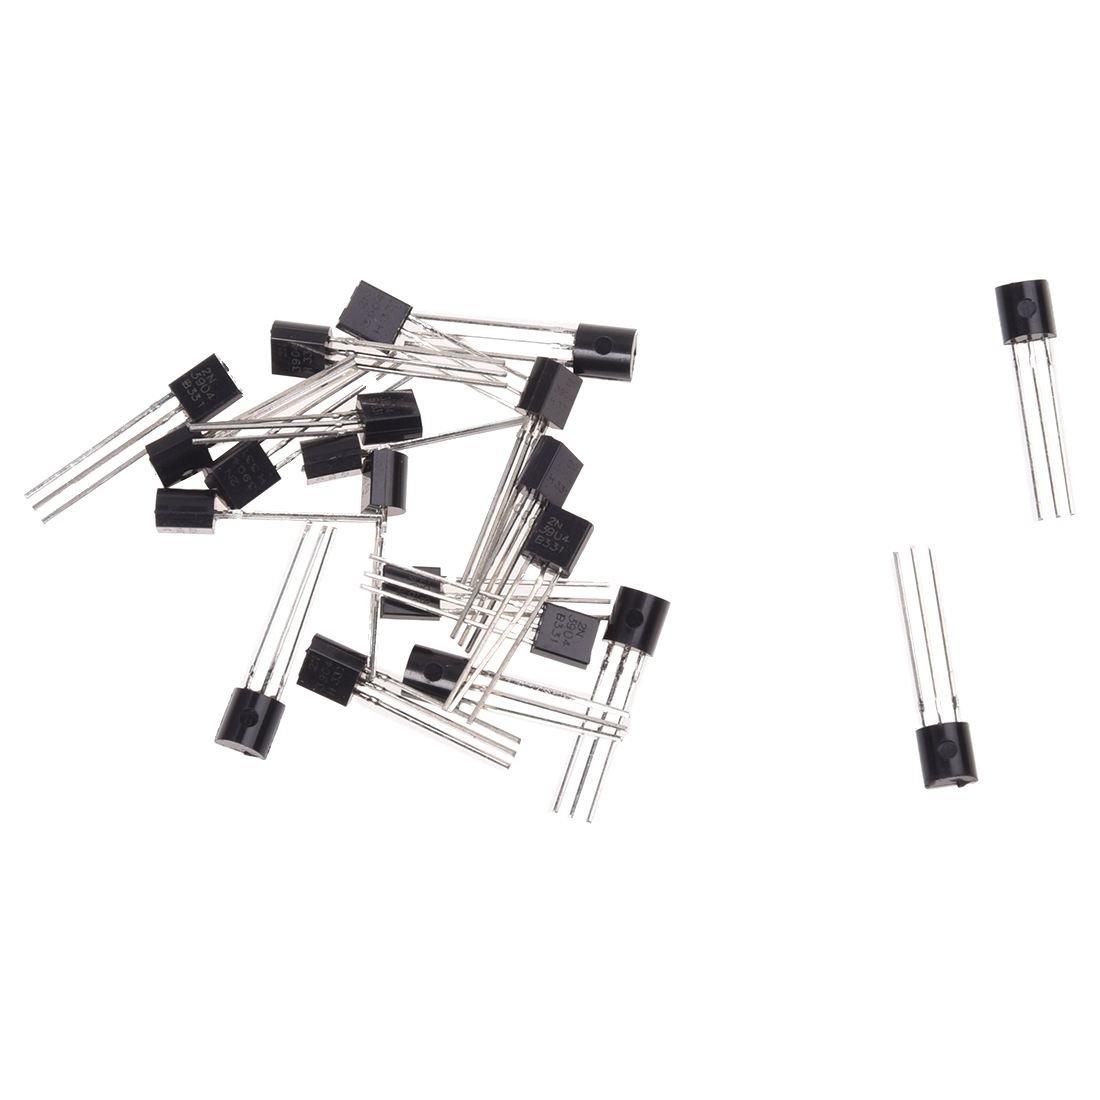 SODIAL(R) 2N3904 Through Hole 3 Pins NPN Bipolar Transistors 20 Pcs